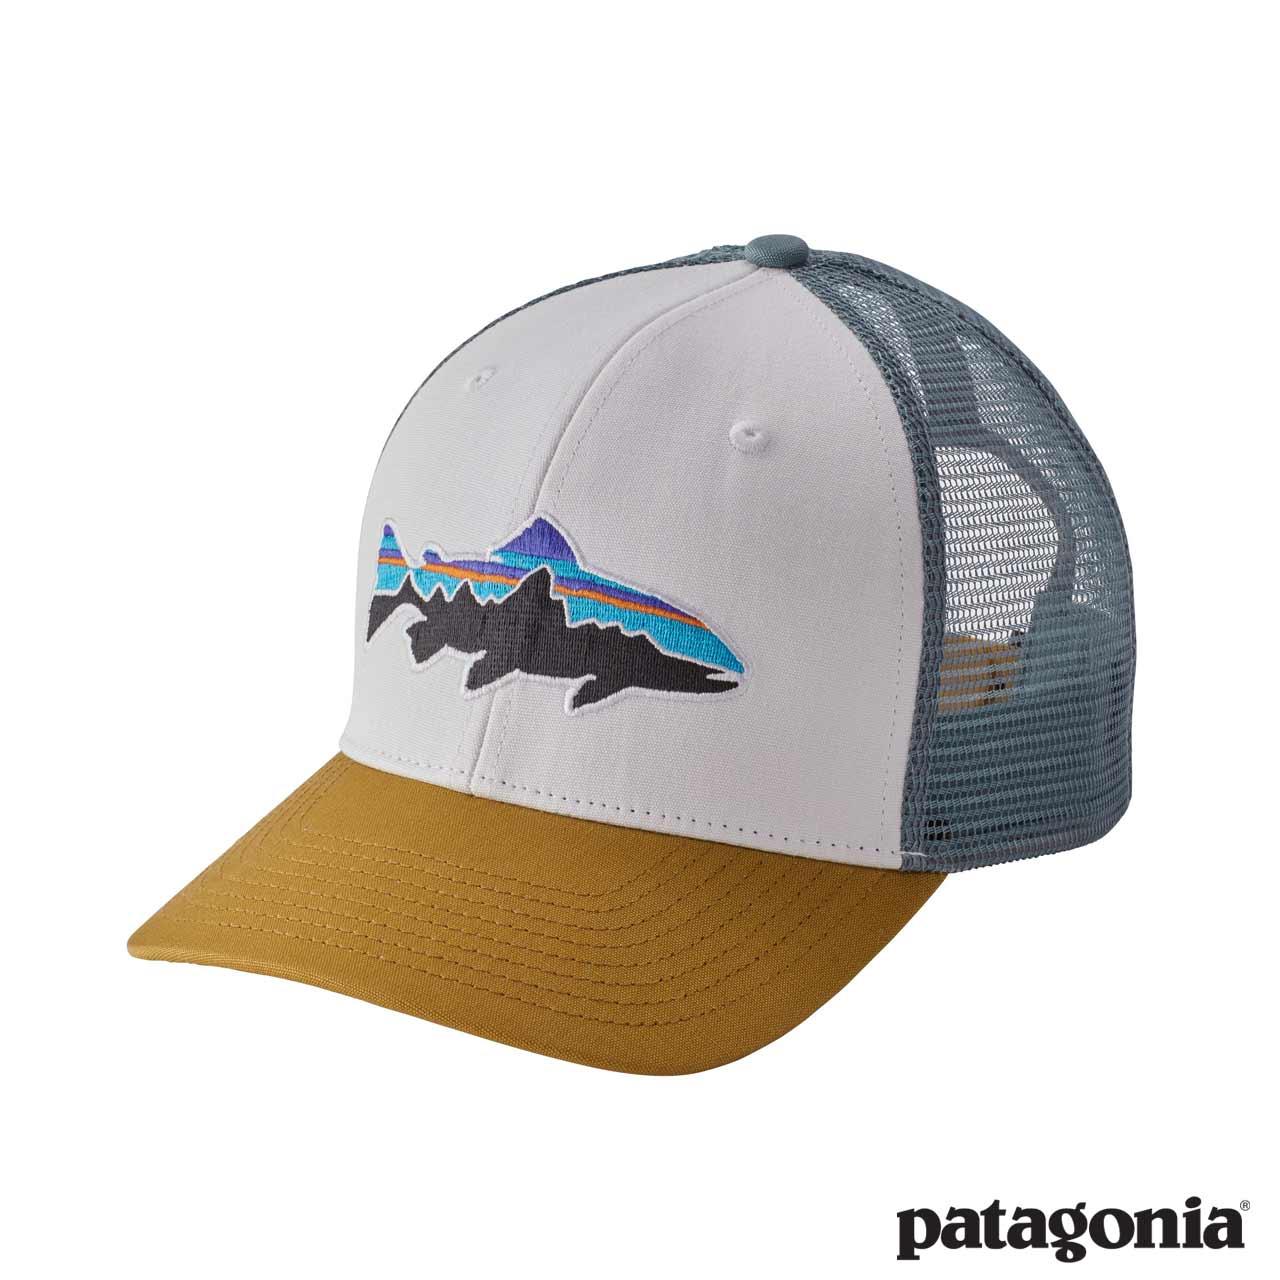 patagonia cappello  Cappello logo trota Fitz Roy Trout Trucker - Patagonia - Like a River